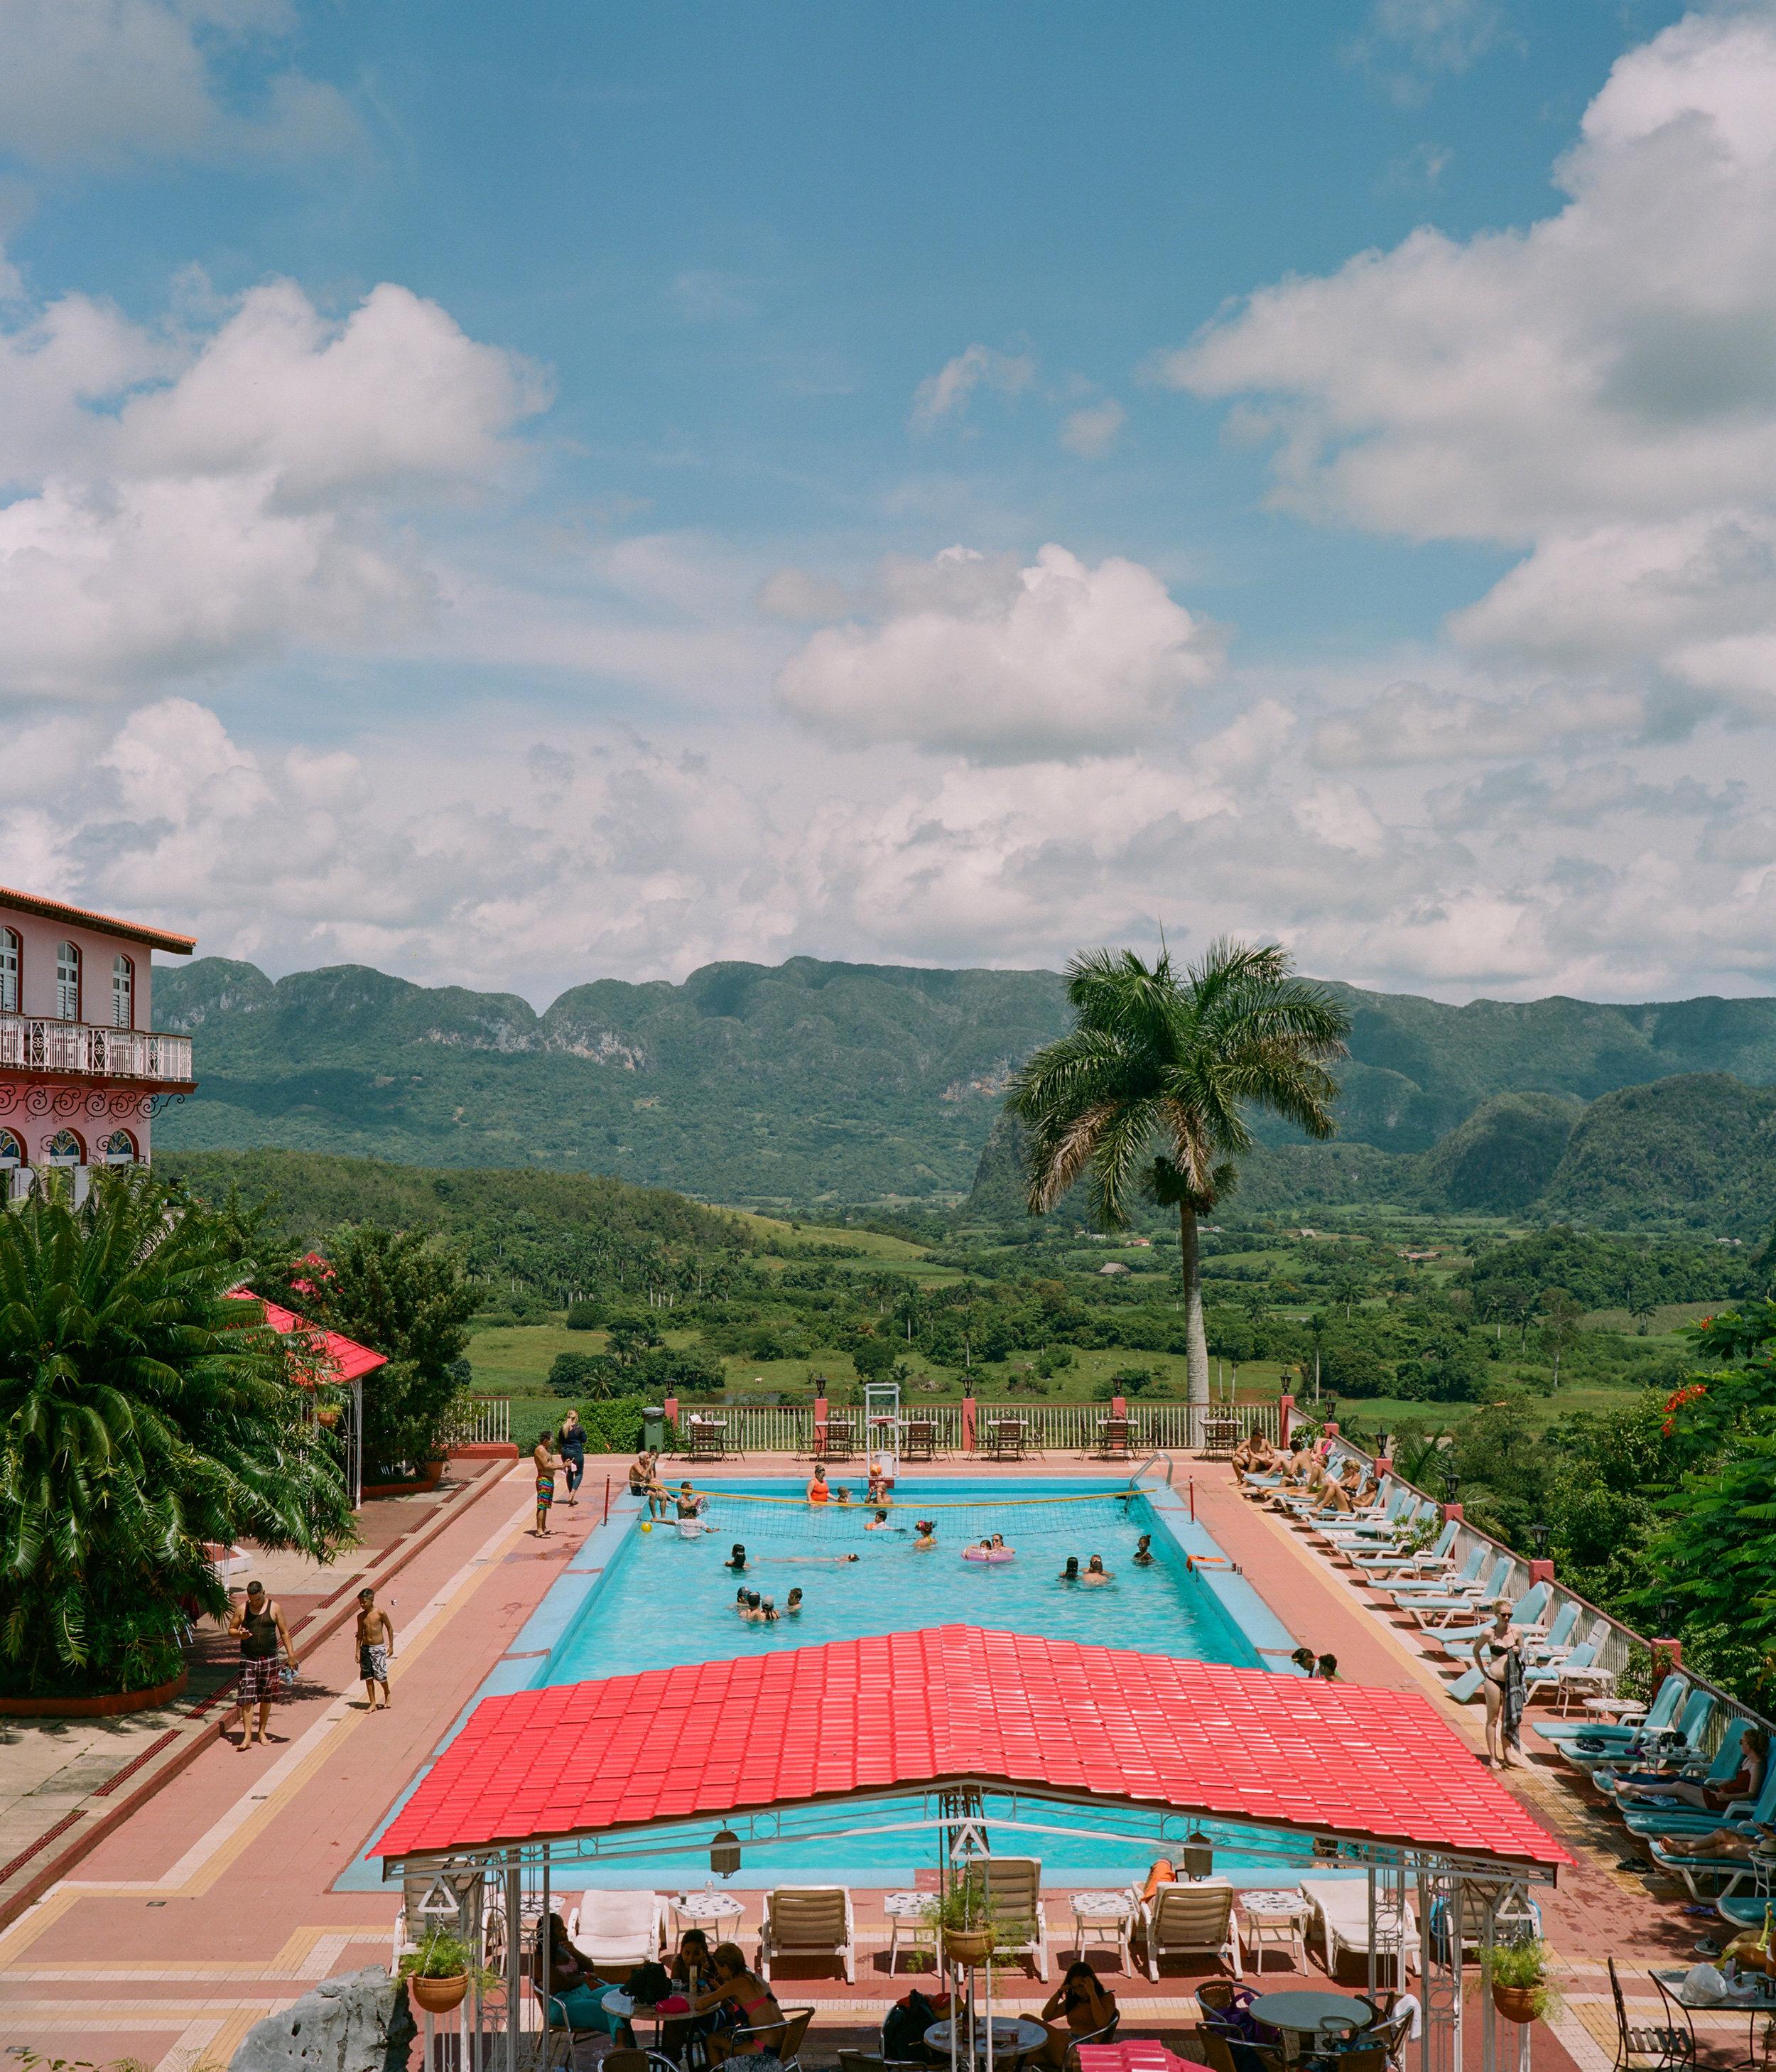 kaytona_kristin aytona_KxN_Cuba-StS-34.jpg